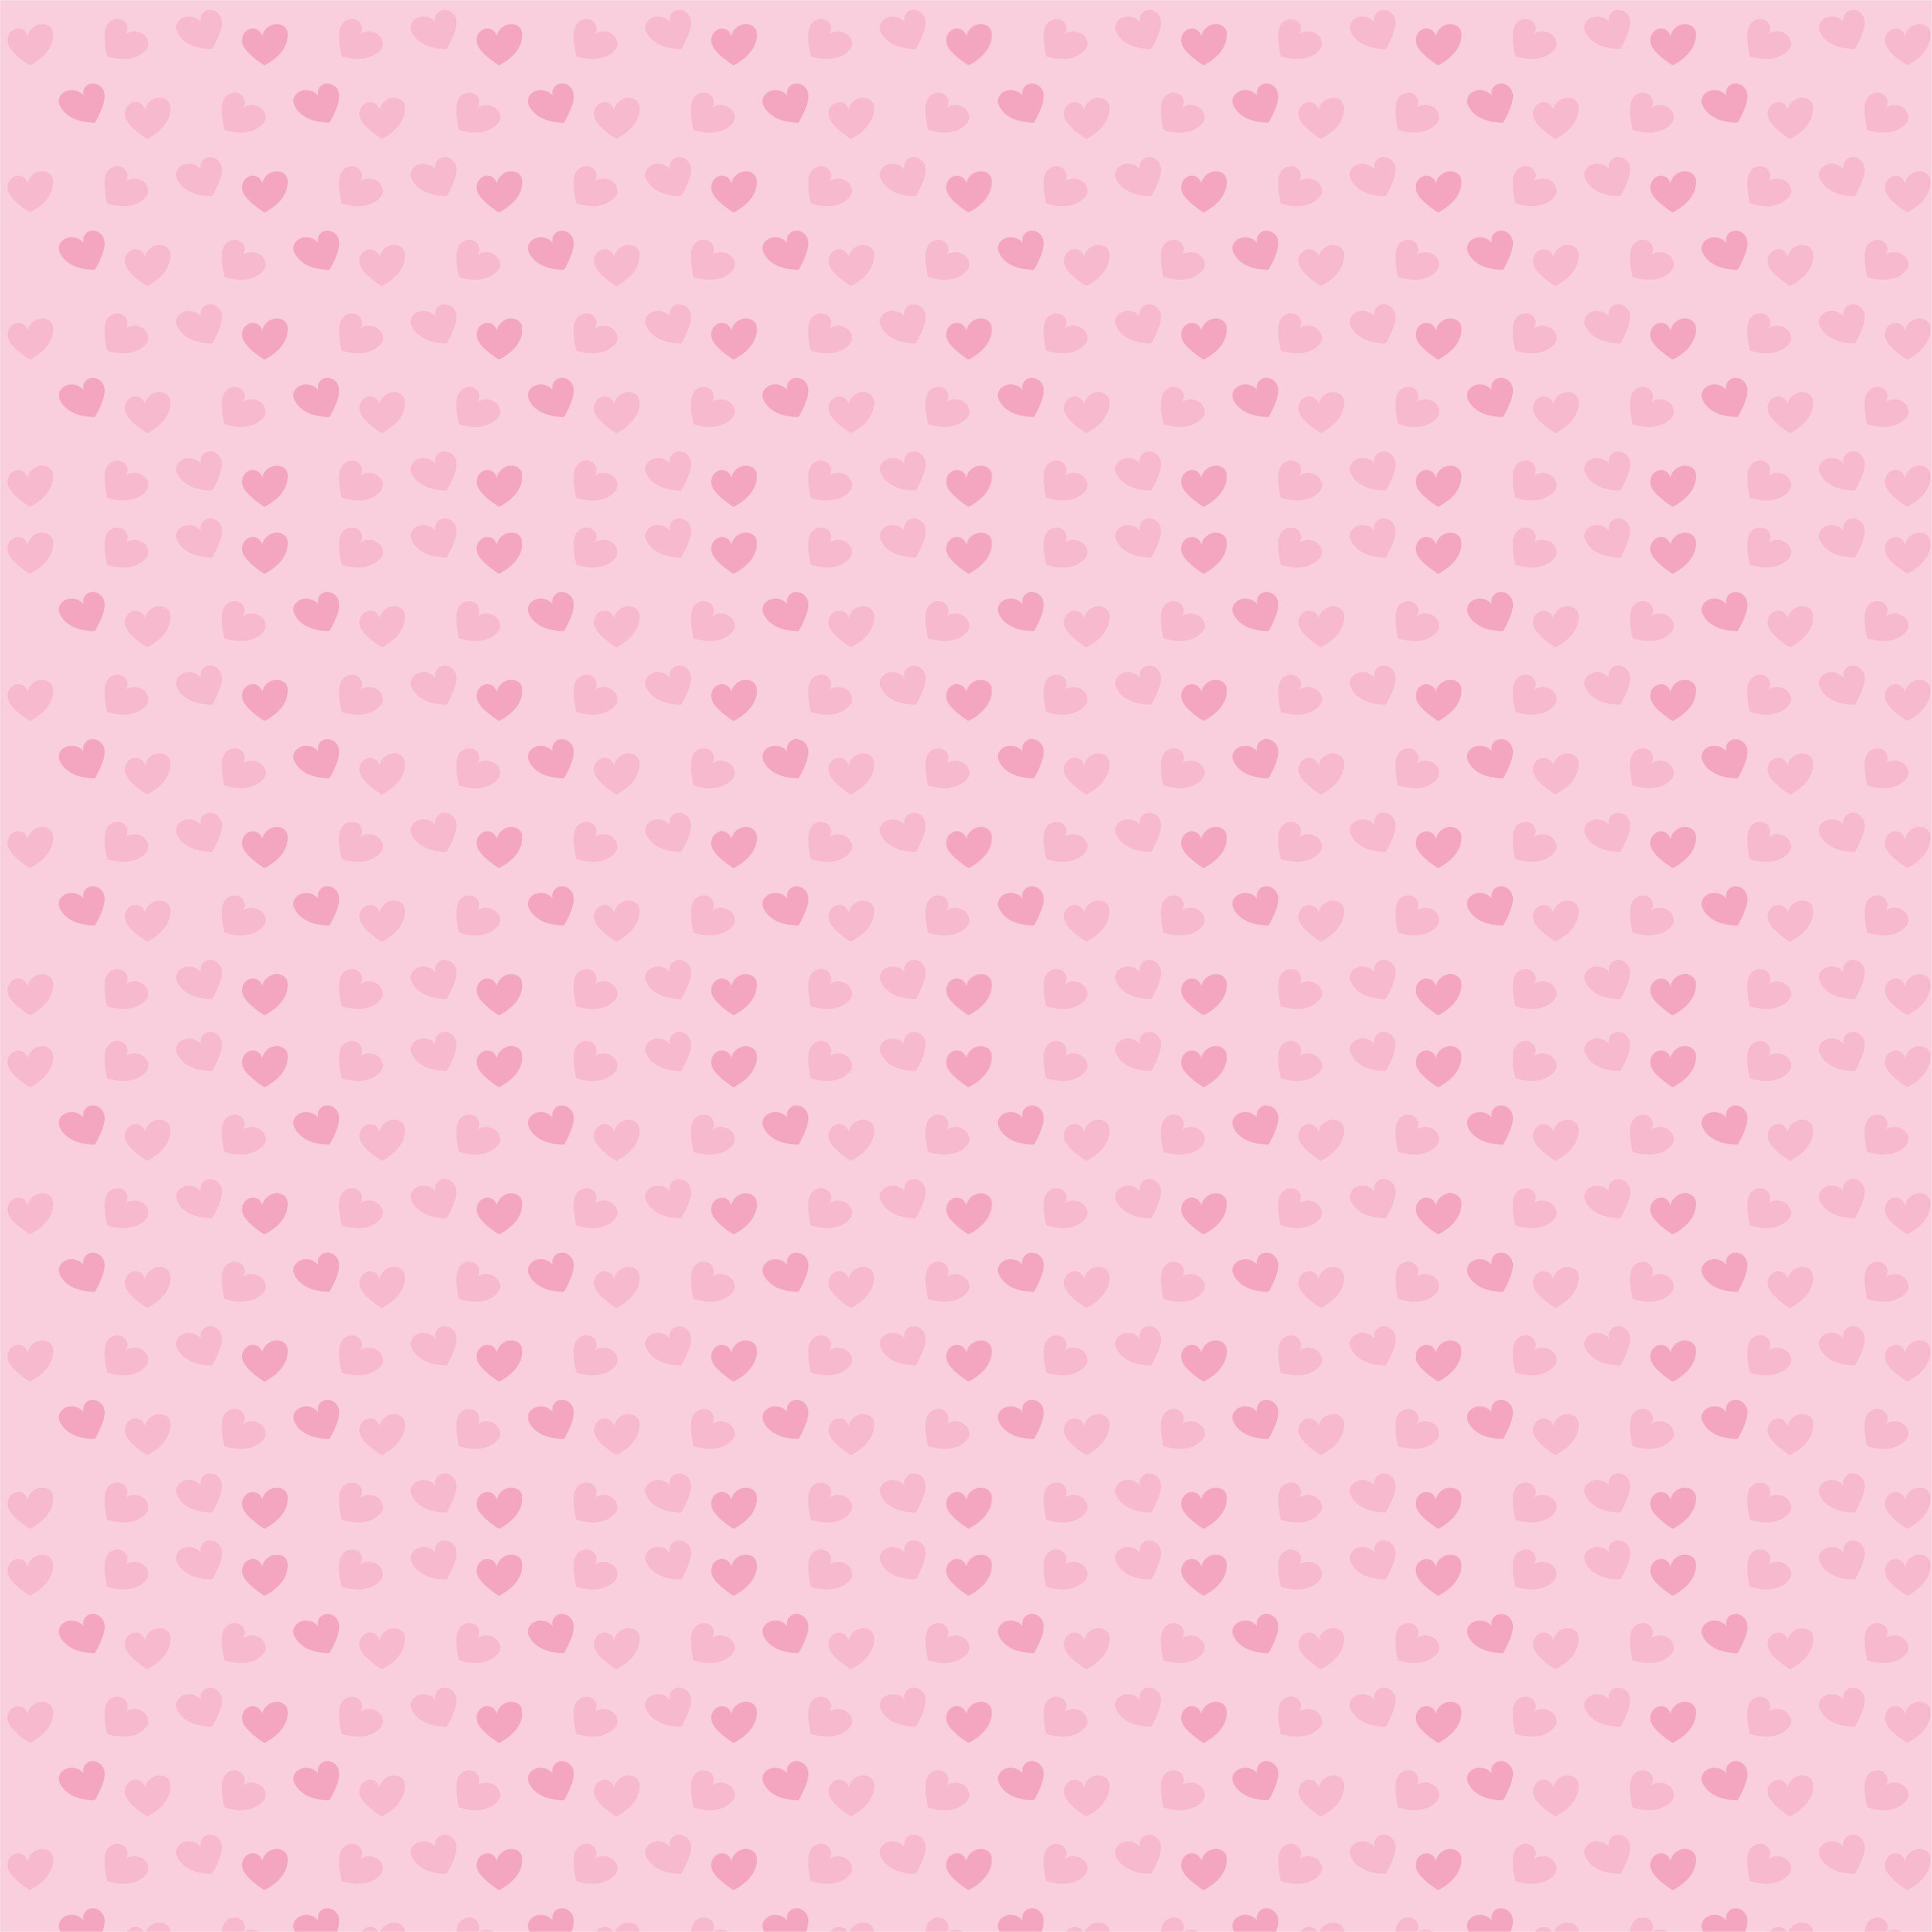 papel digital chuva de amor menina 4